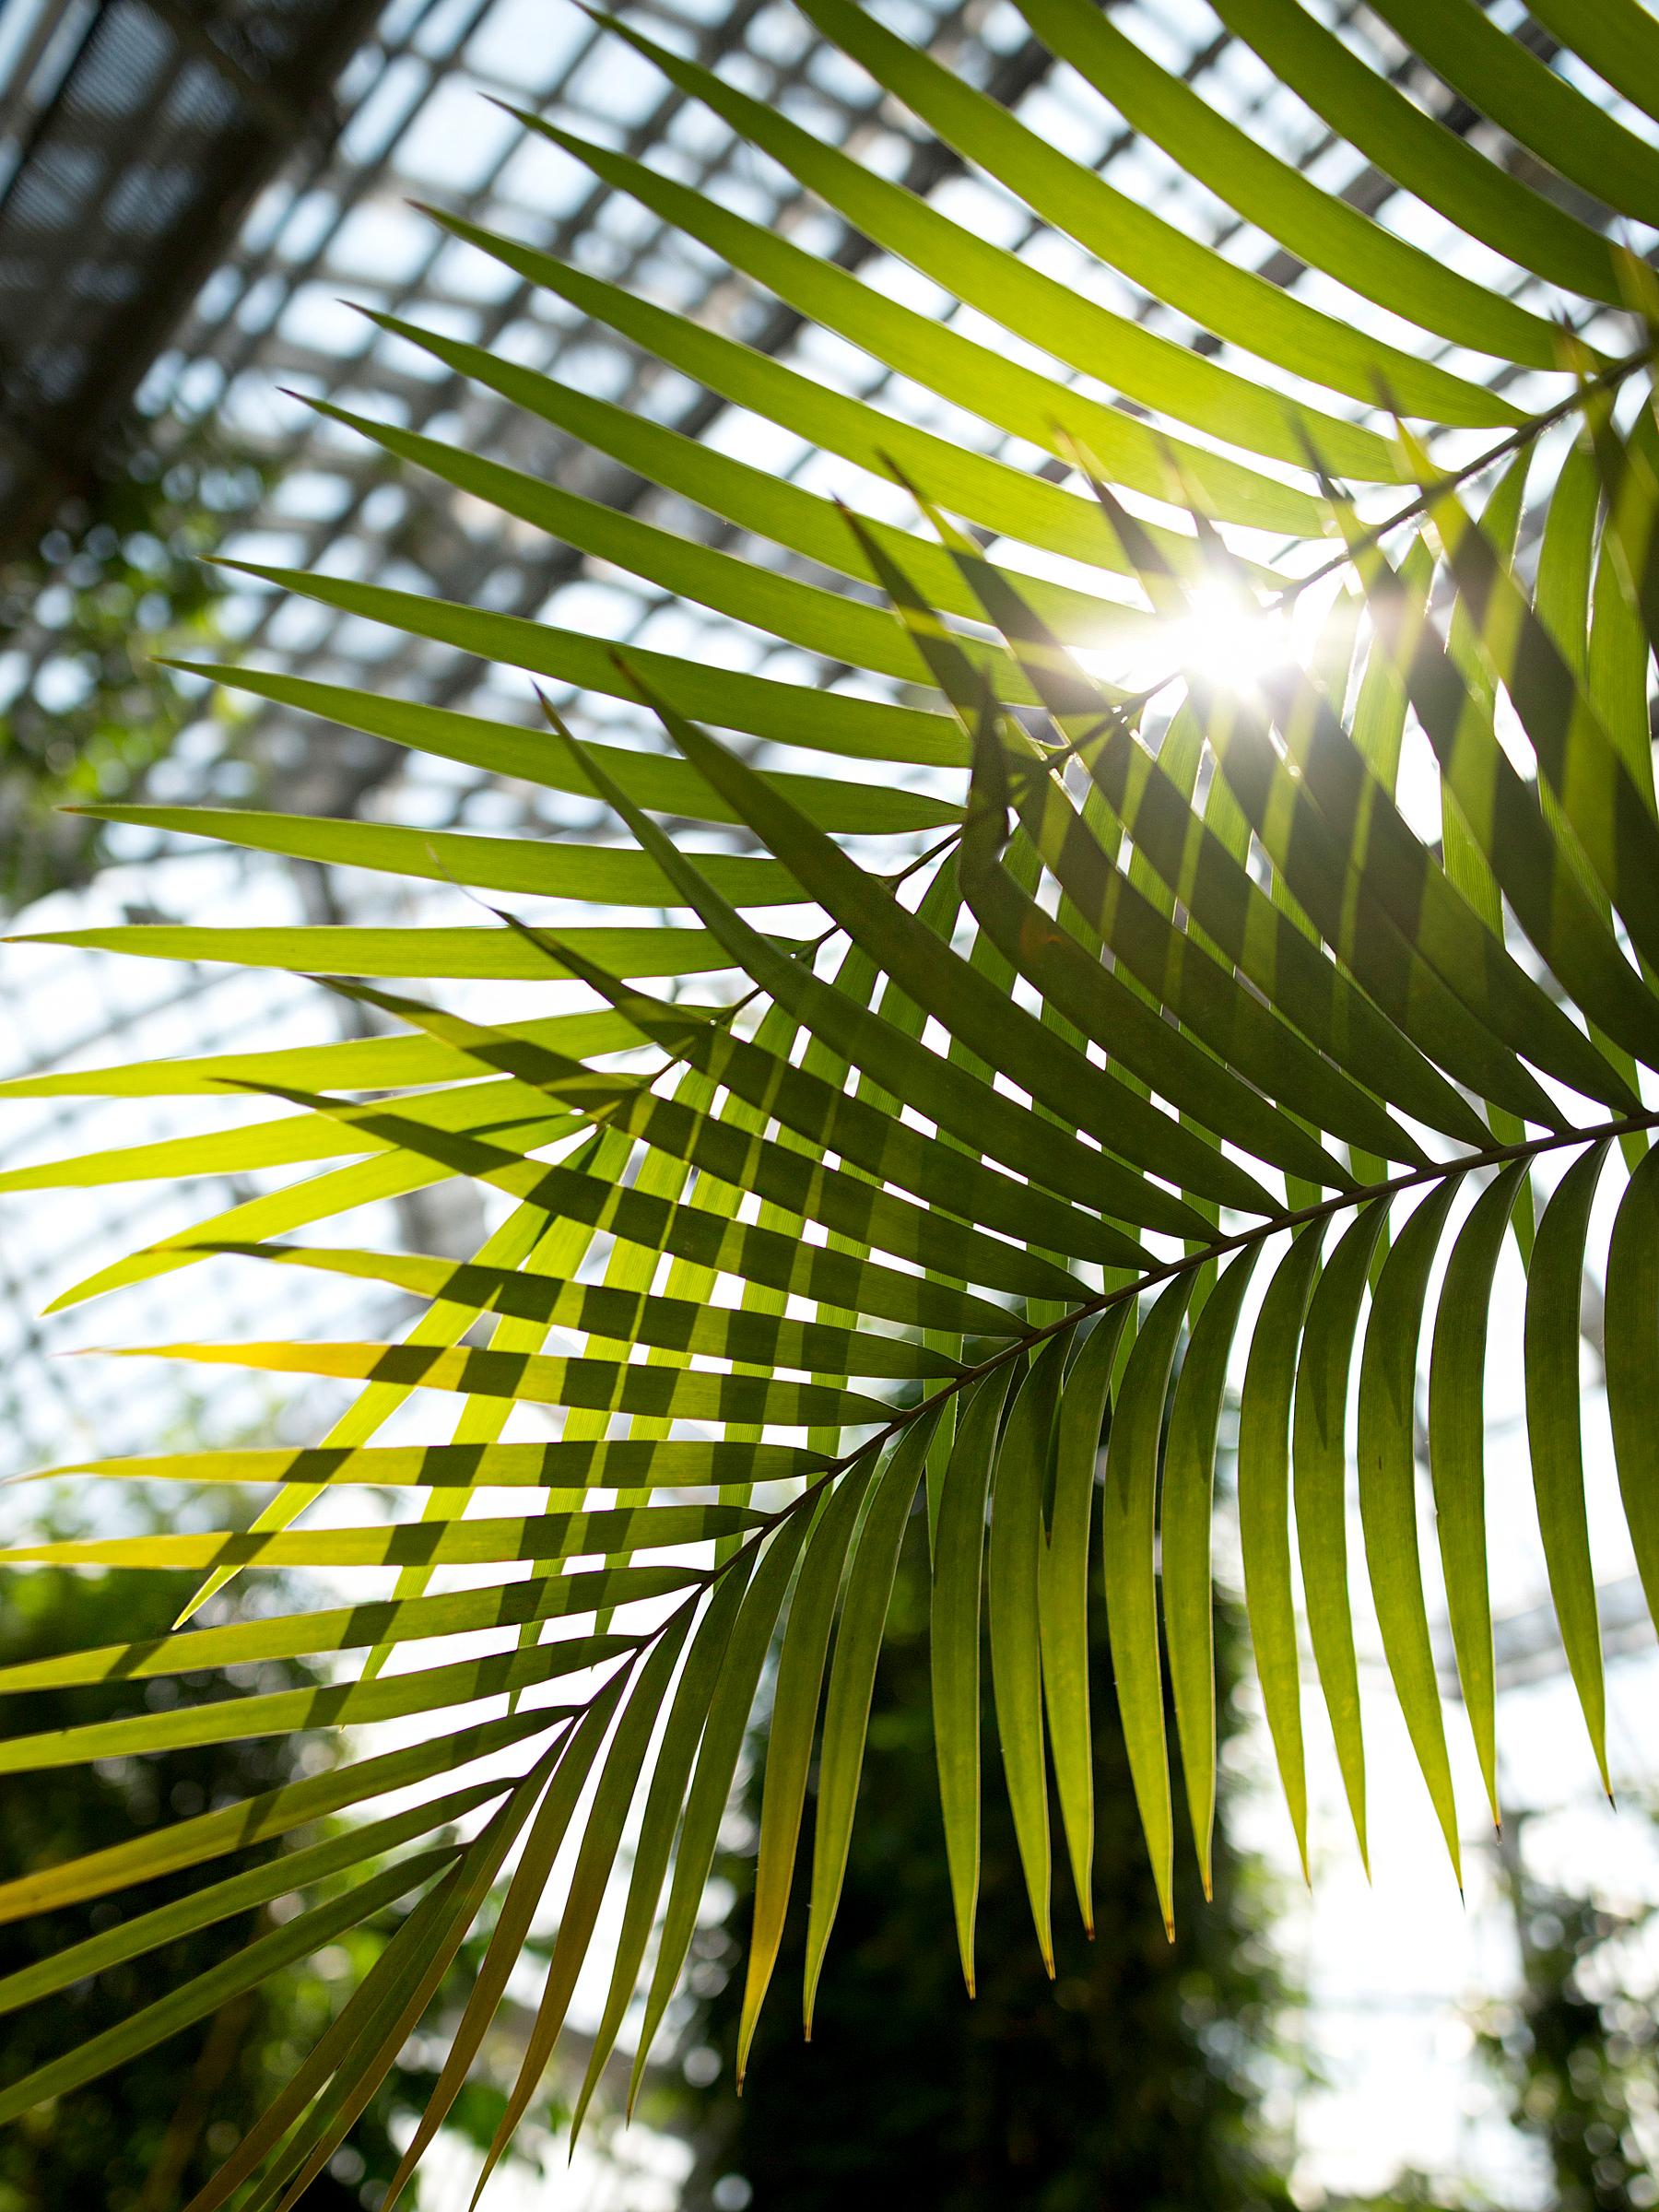 aperol spritz summer aperitif drink cocktail recipe personal urban jungle garden palm tree holiday feeling white crochet dress hm gucci belt saint laurent wedges dionysus ricarda schernus fashionblogger 3